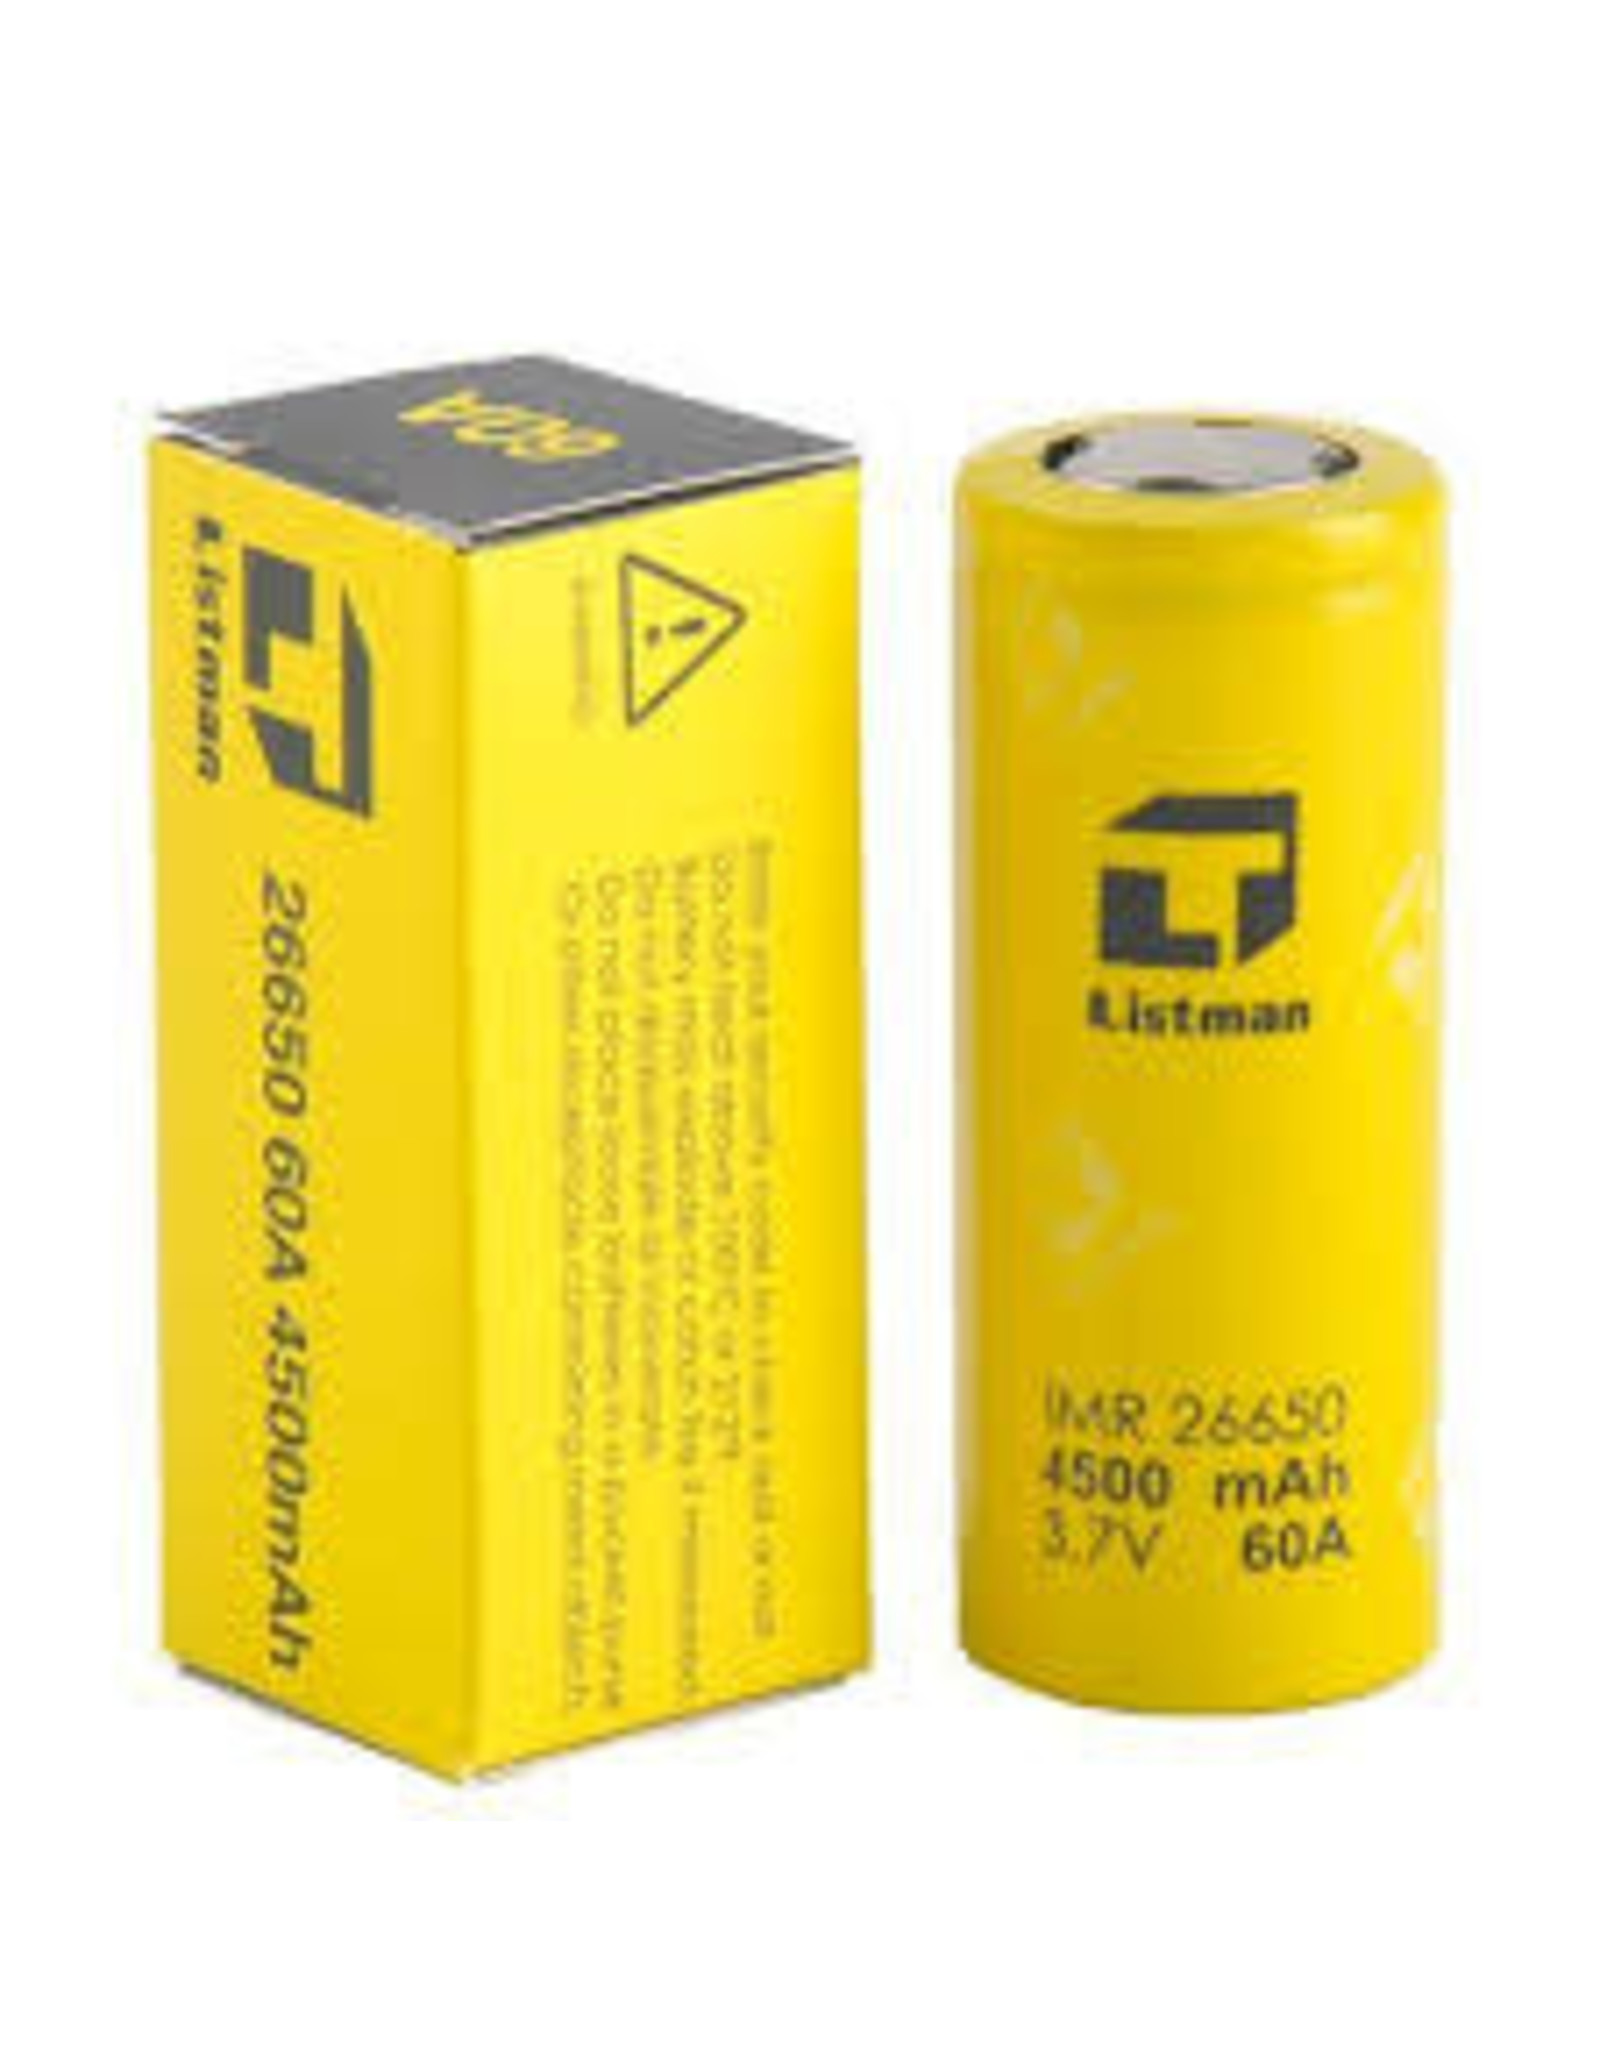 Listman Listman IMR 26650 60A 4500mah Battery (Single)